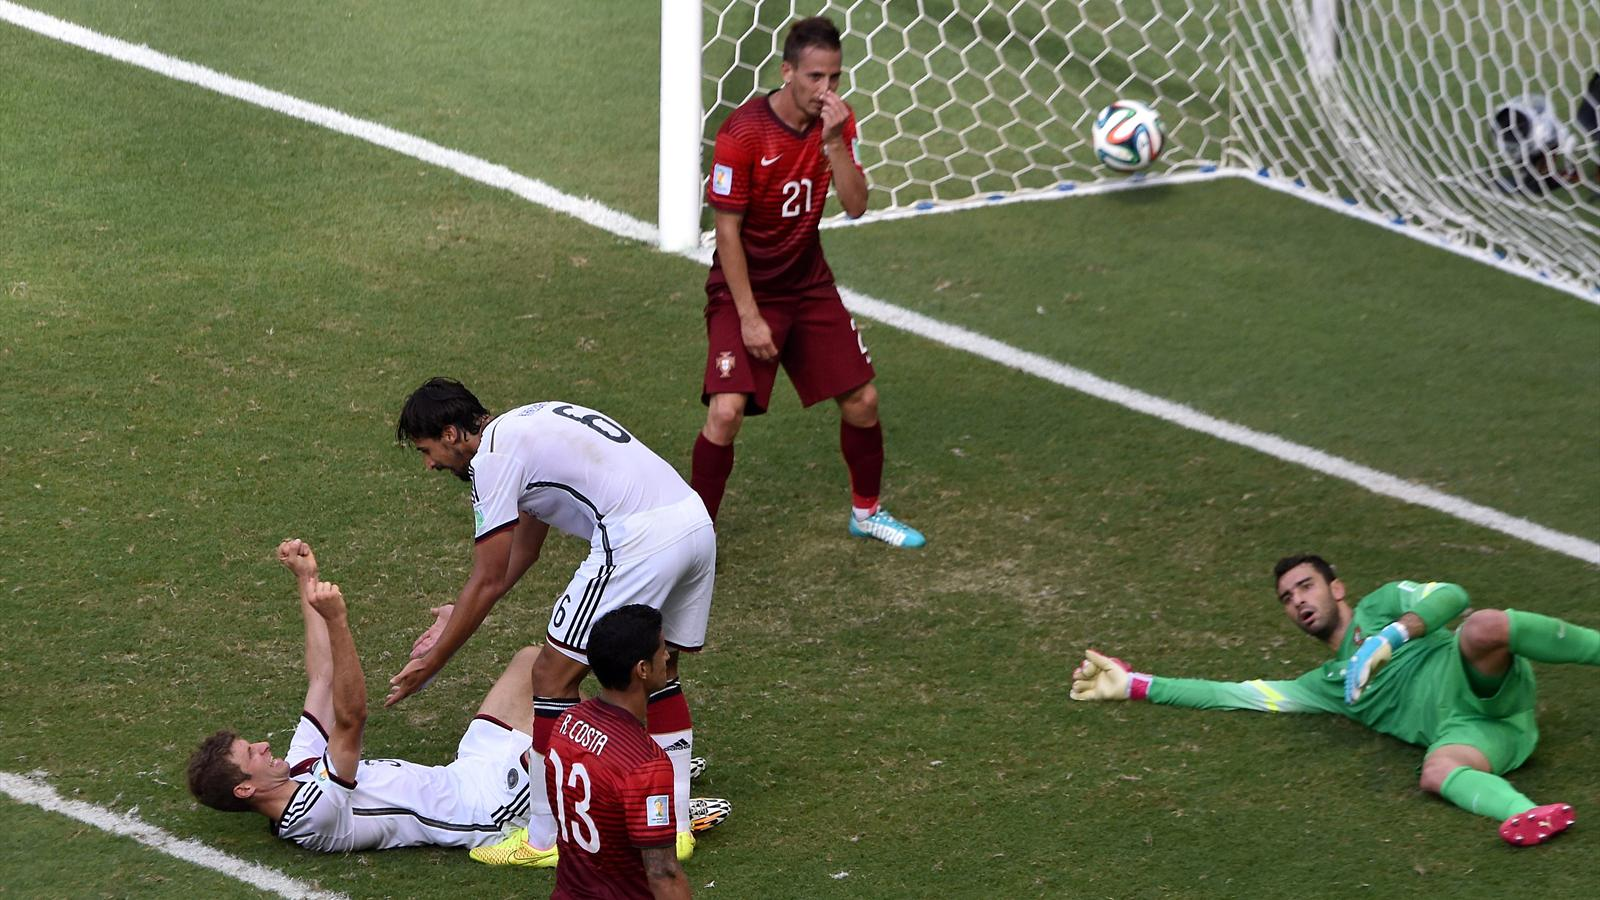 CDM 2014-Allemagne 4-0 Portugal: Müller puissance 3